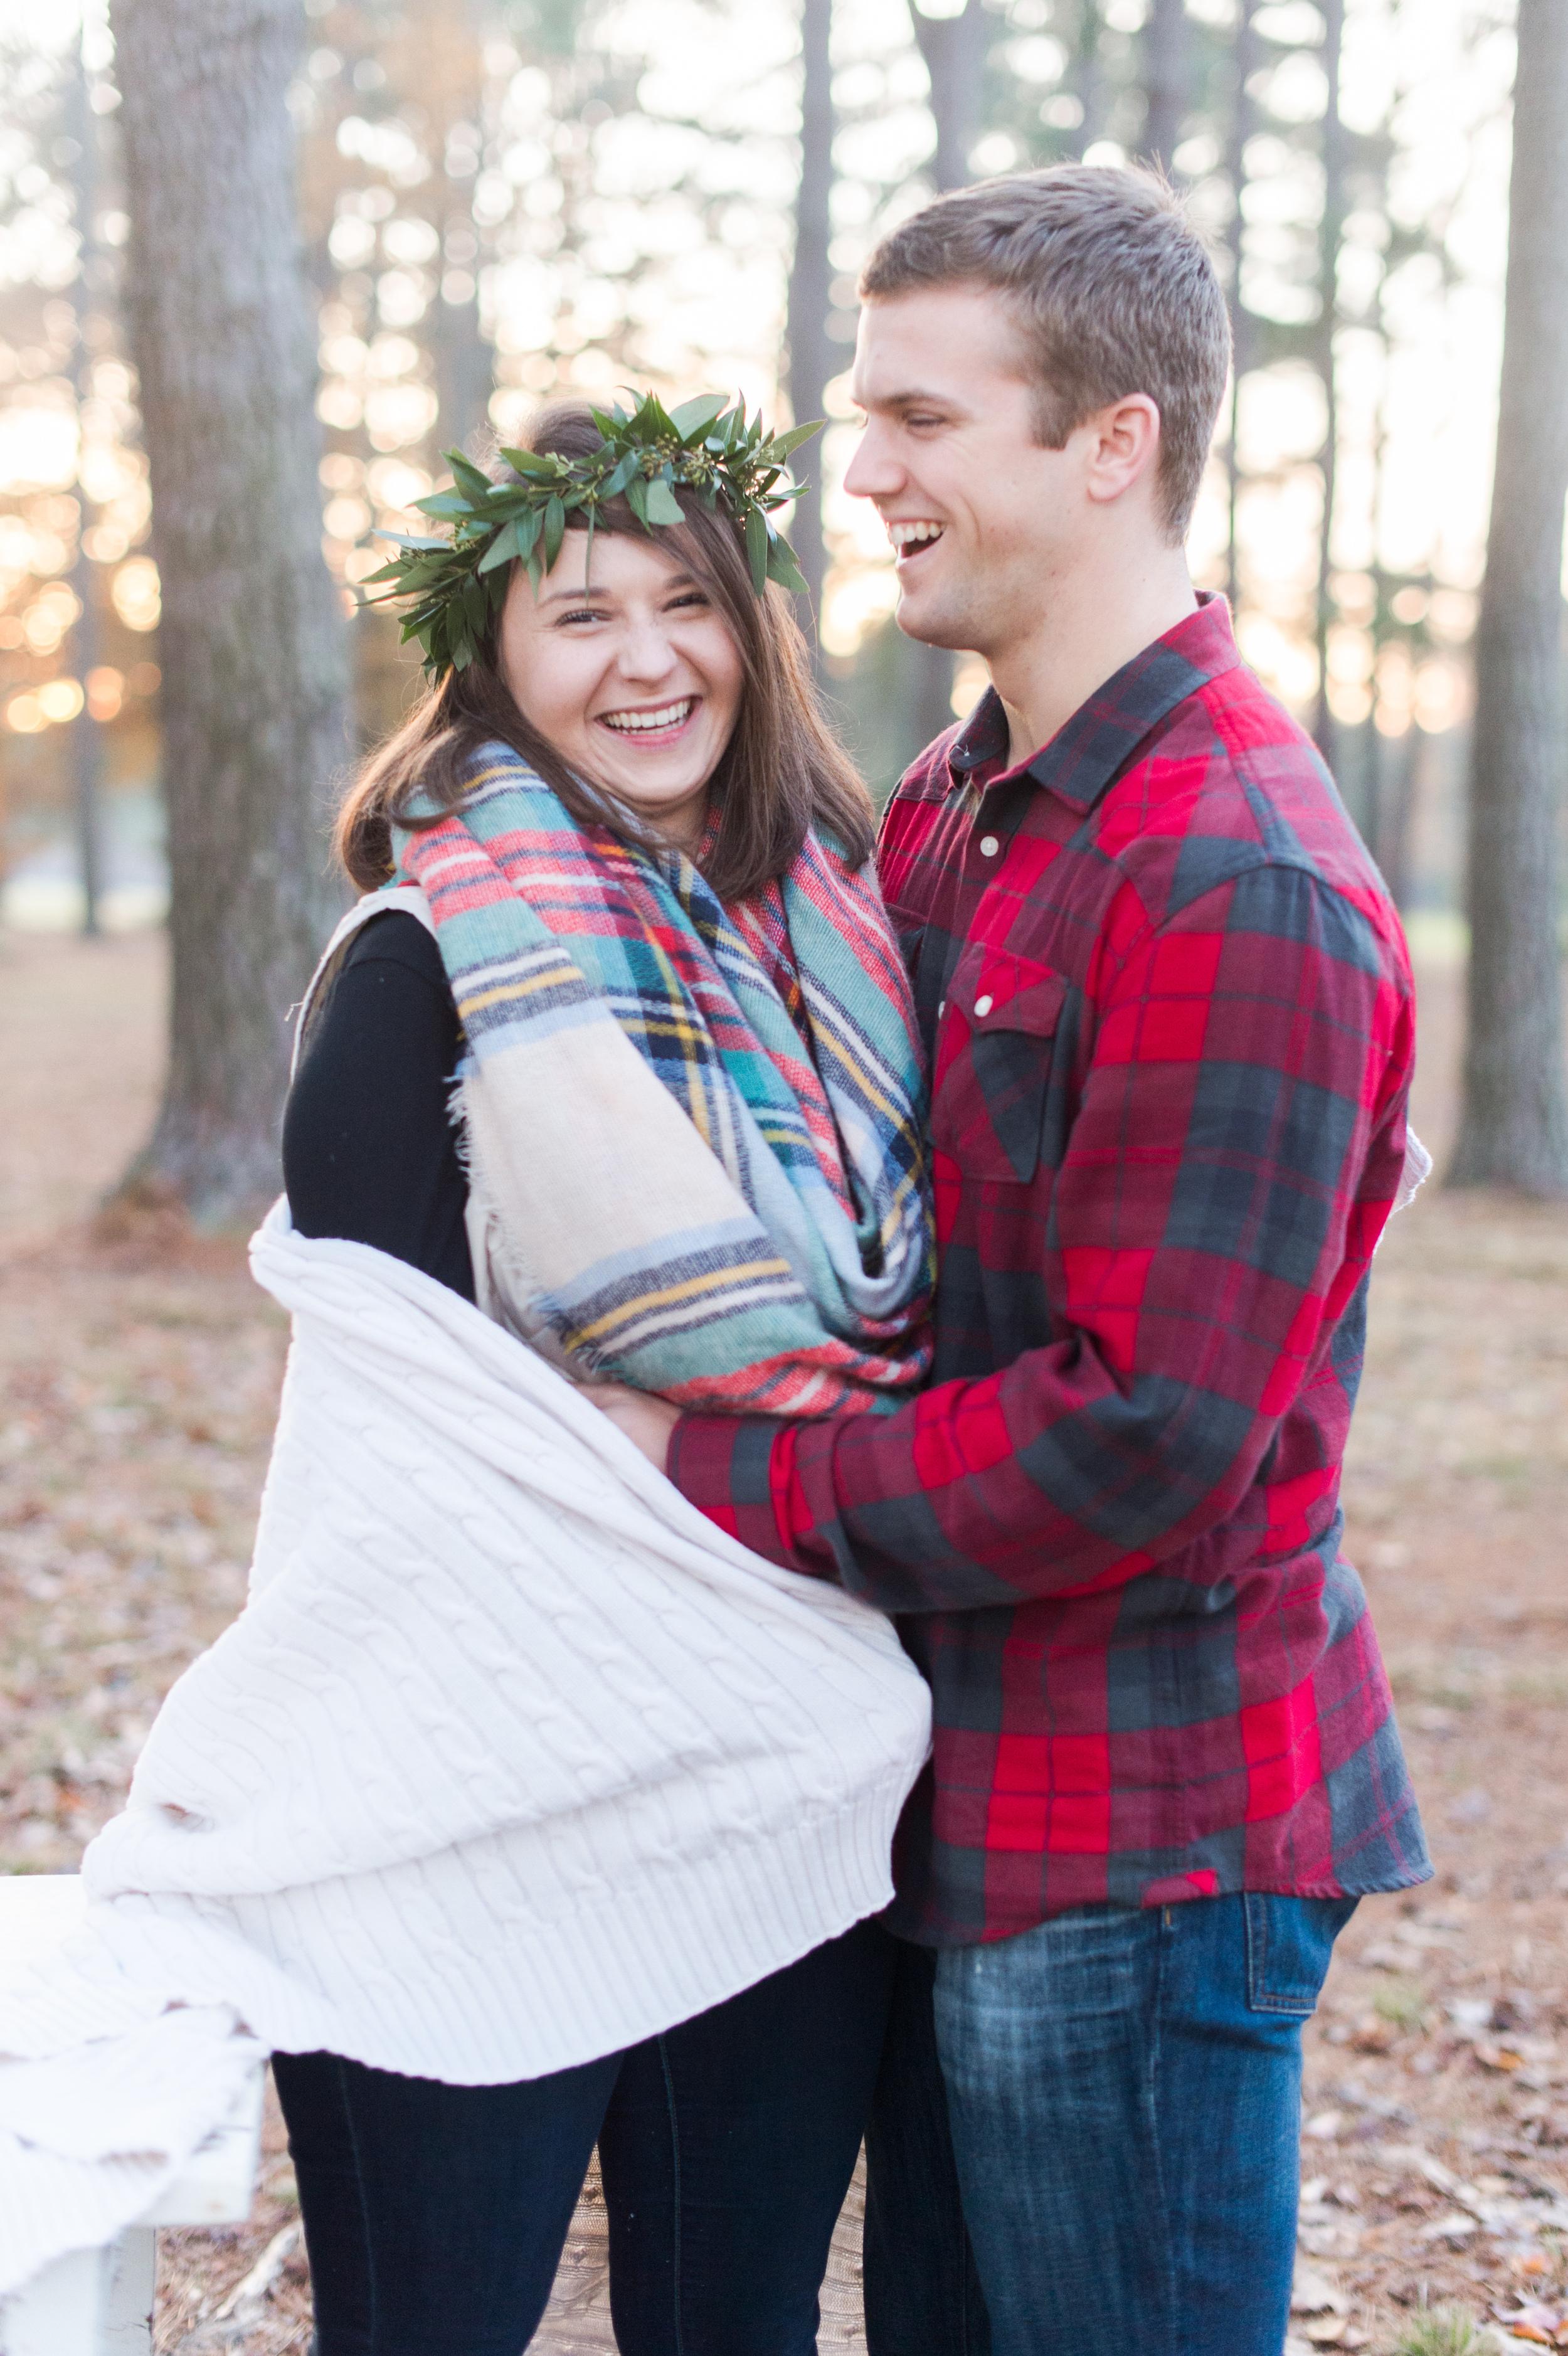 Elizabeth Henson Photography with Courtney Inghram Events Newlywed Christmas Photos